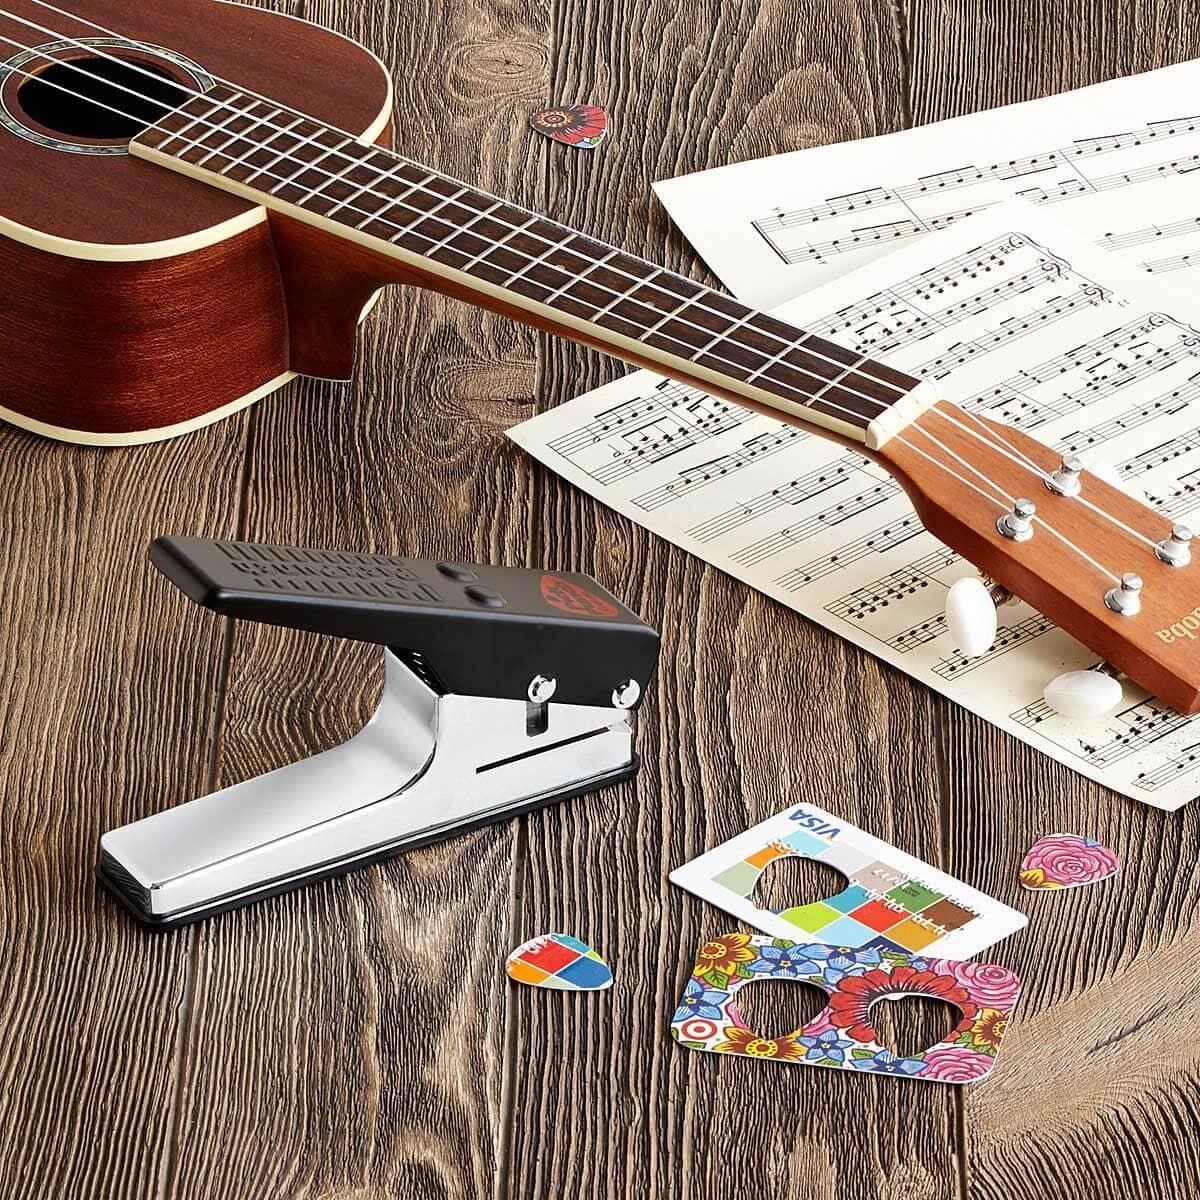 Pick Punch to Create Custom Guitar Picks